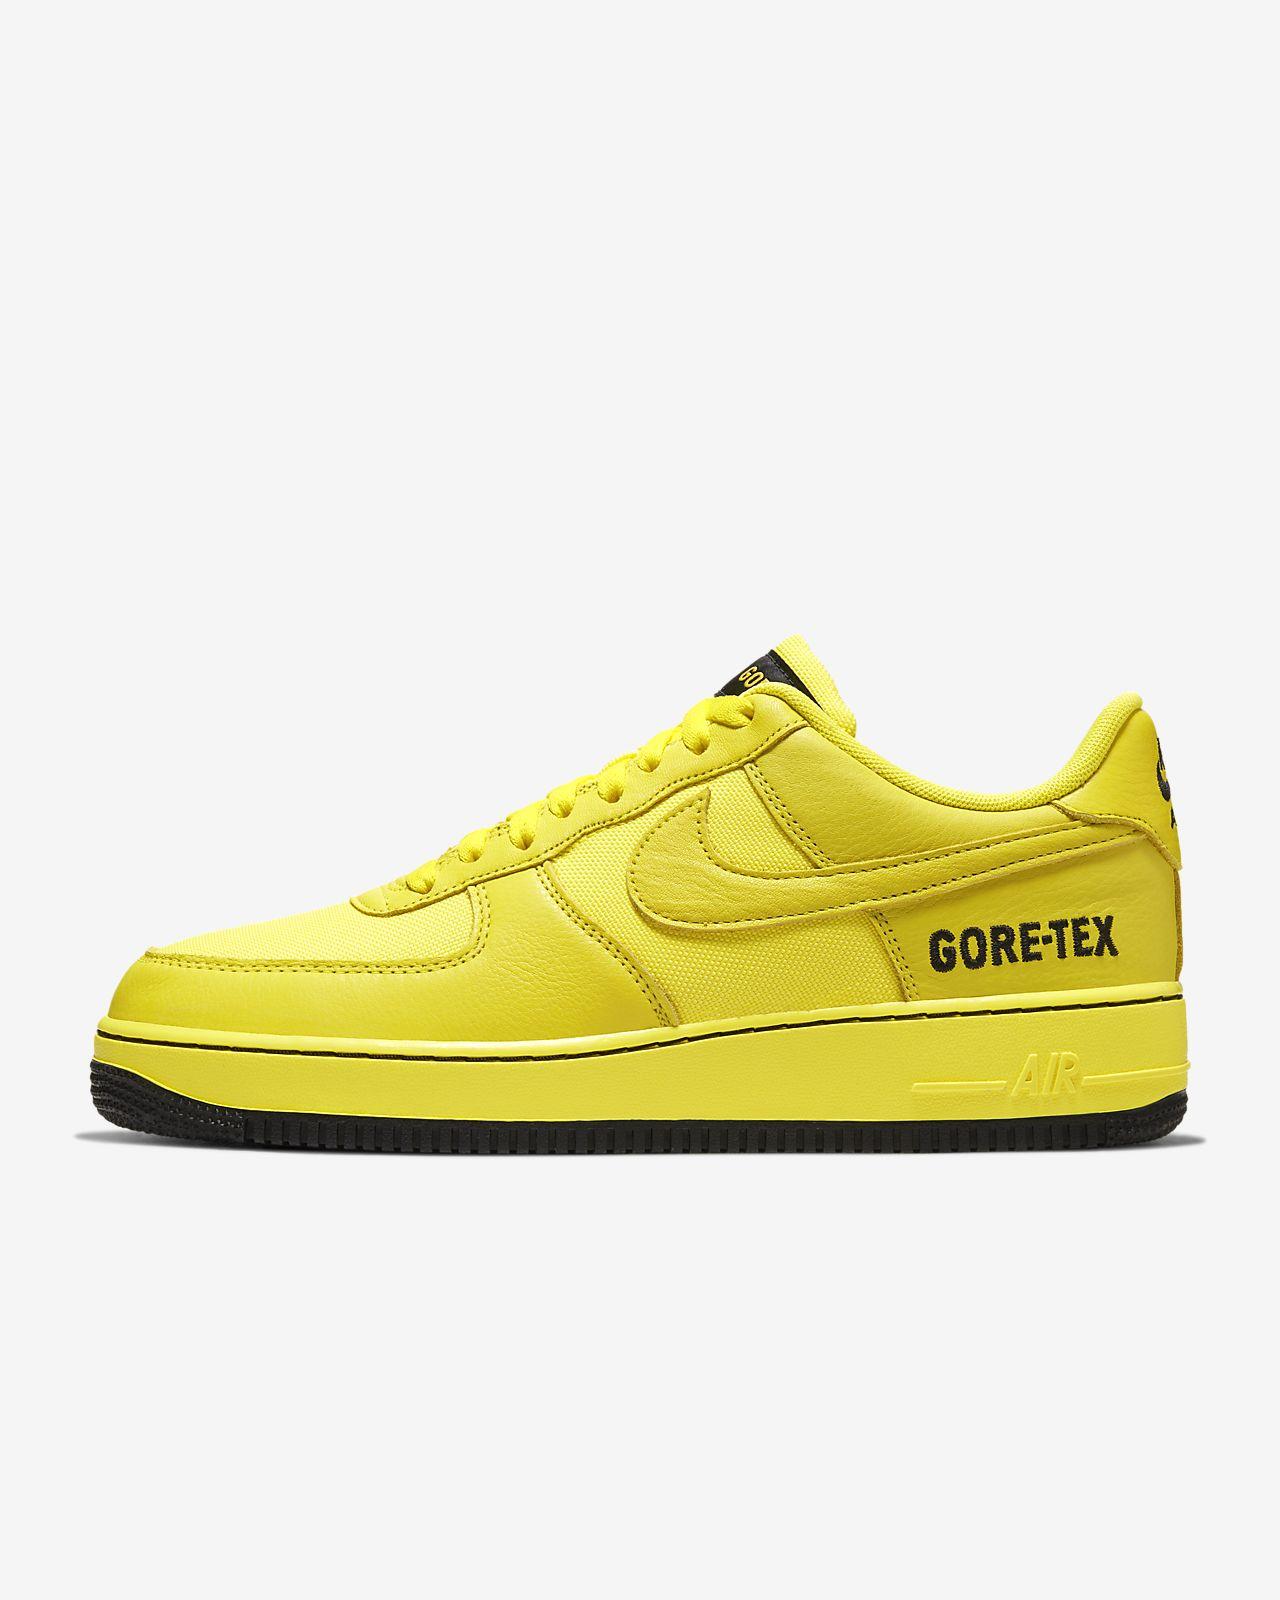 Bota Nike Air Force 1 GORE-TEX